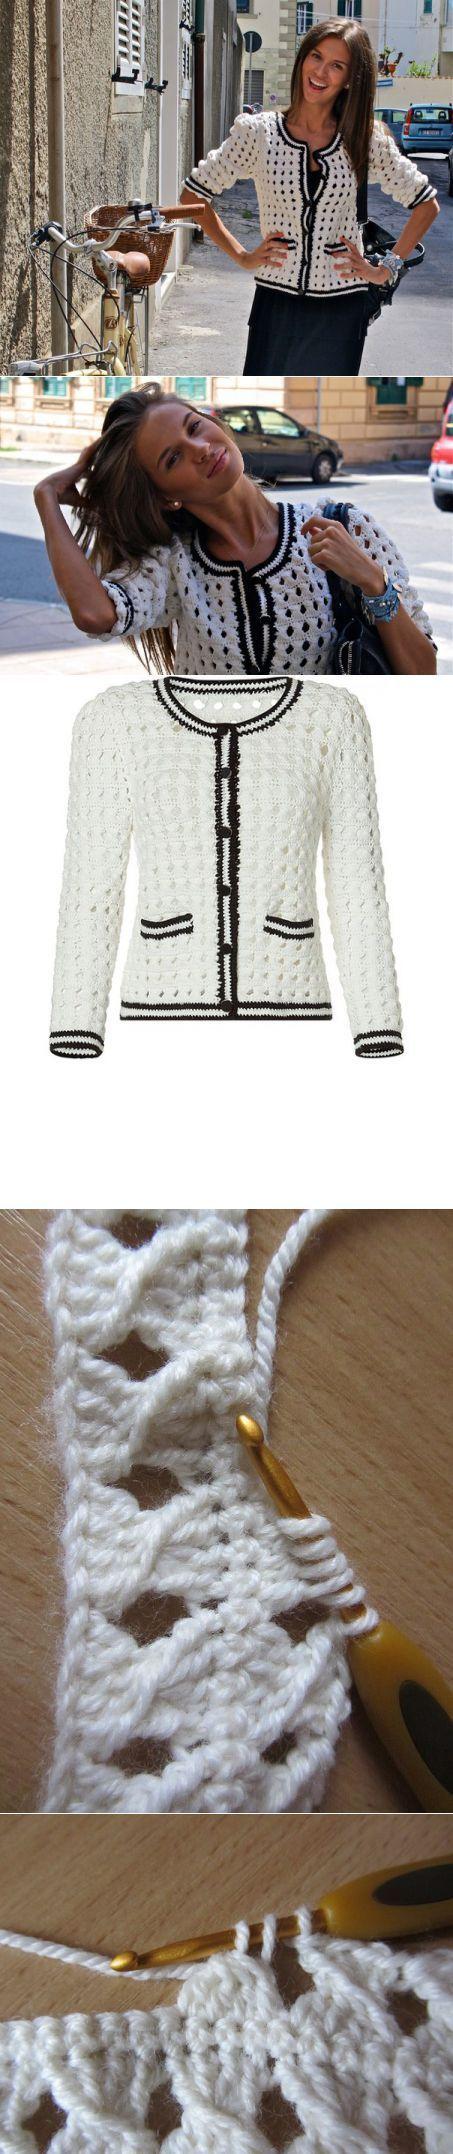 Chanel tarzı ceket | вязание крючком | Постила: